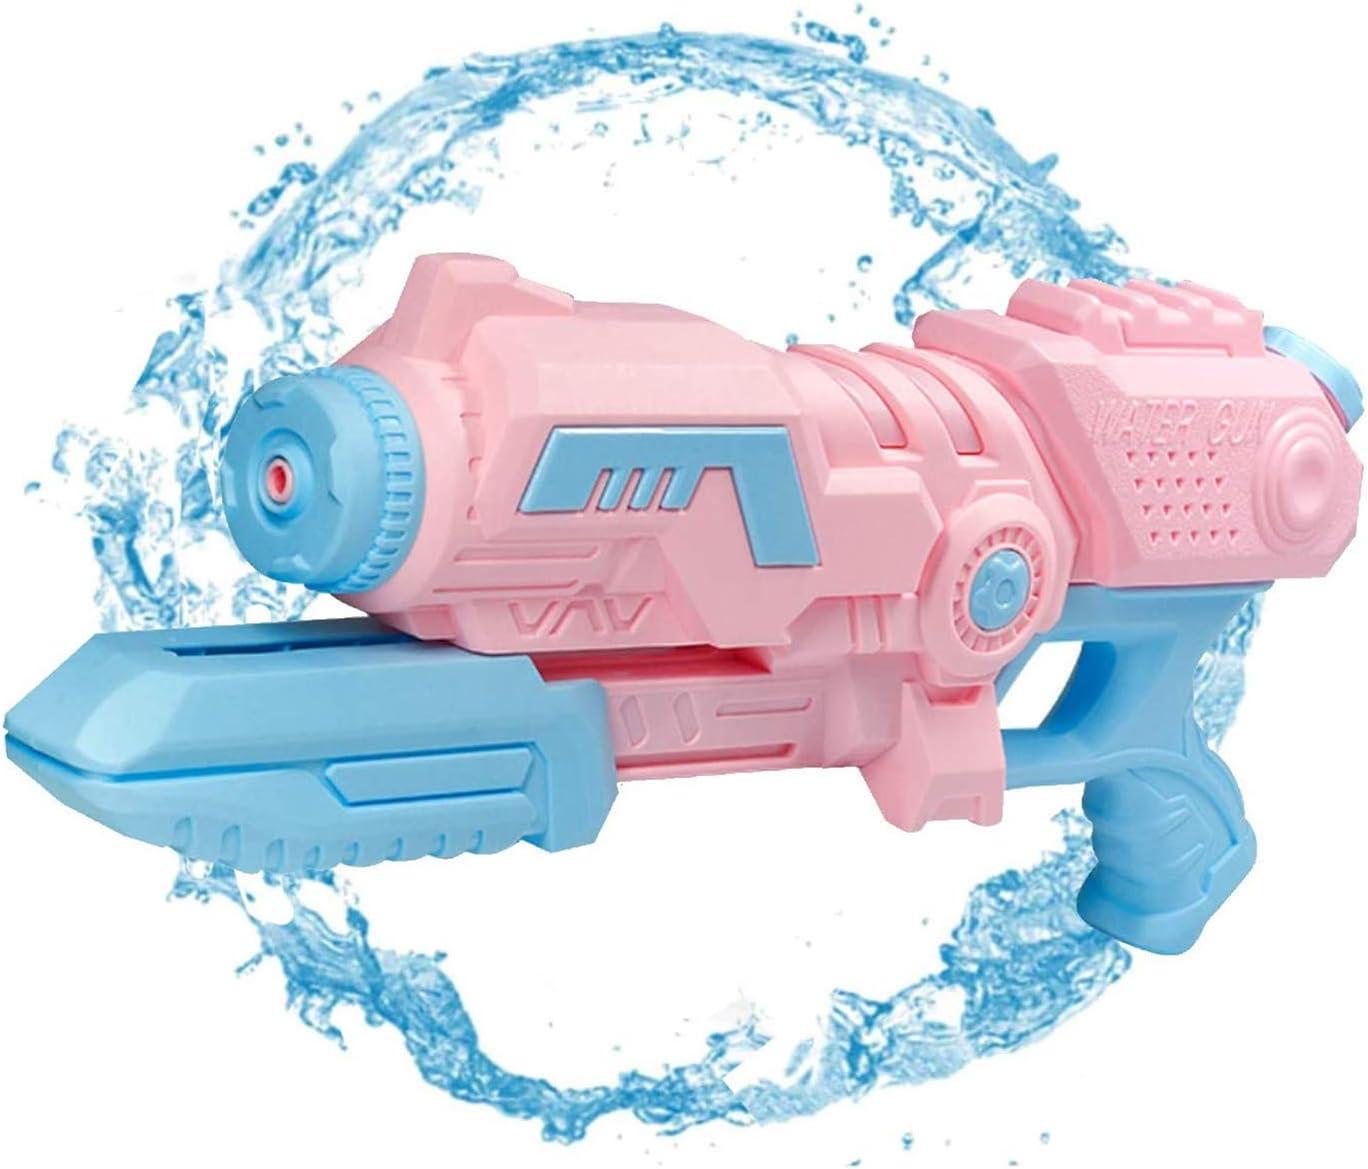 Sunshine smile Pistola de Agua Grande,Pistola de Agua Juguete,Pistola de Agua Alcance Largo,Pistola de Agua niños Adultos,Pistola de Agua de Verano para Playa (Rosa Claro)